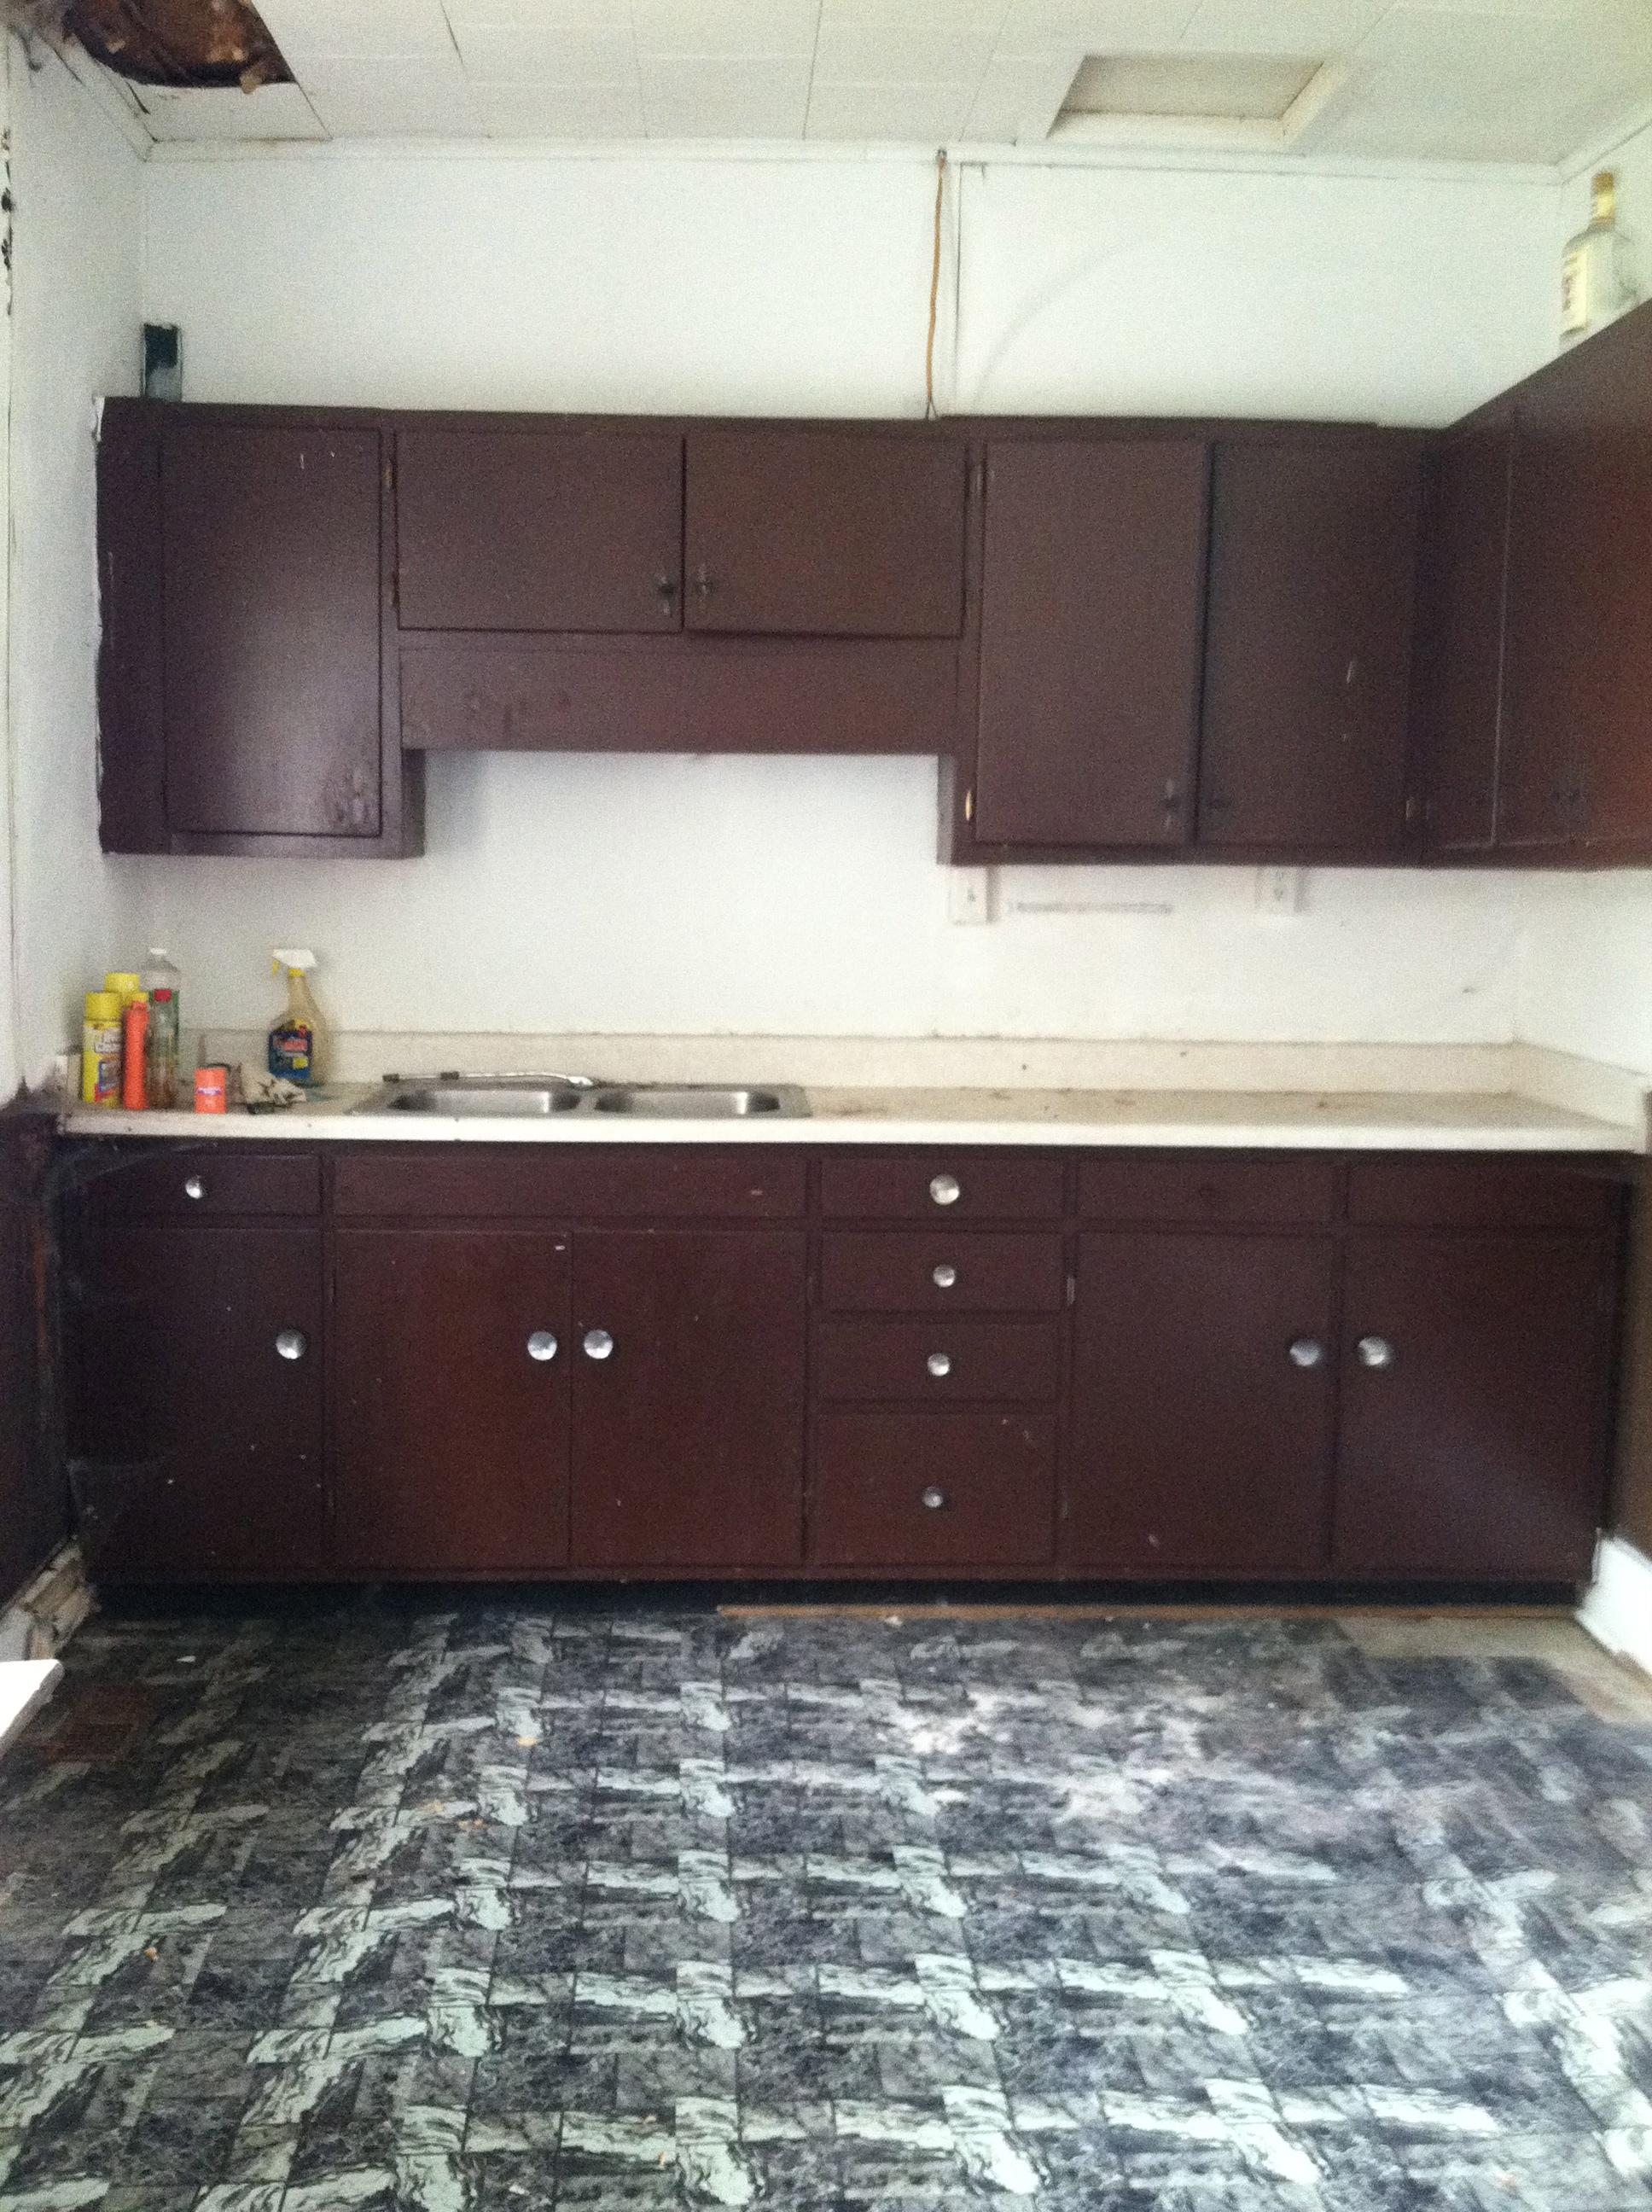 Kitchen July 2012